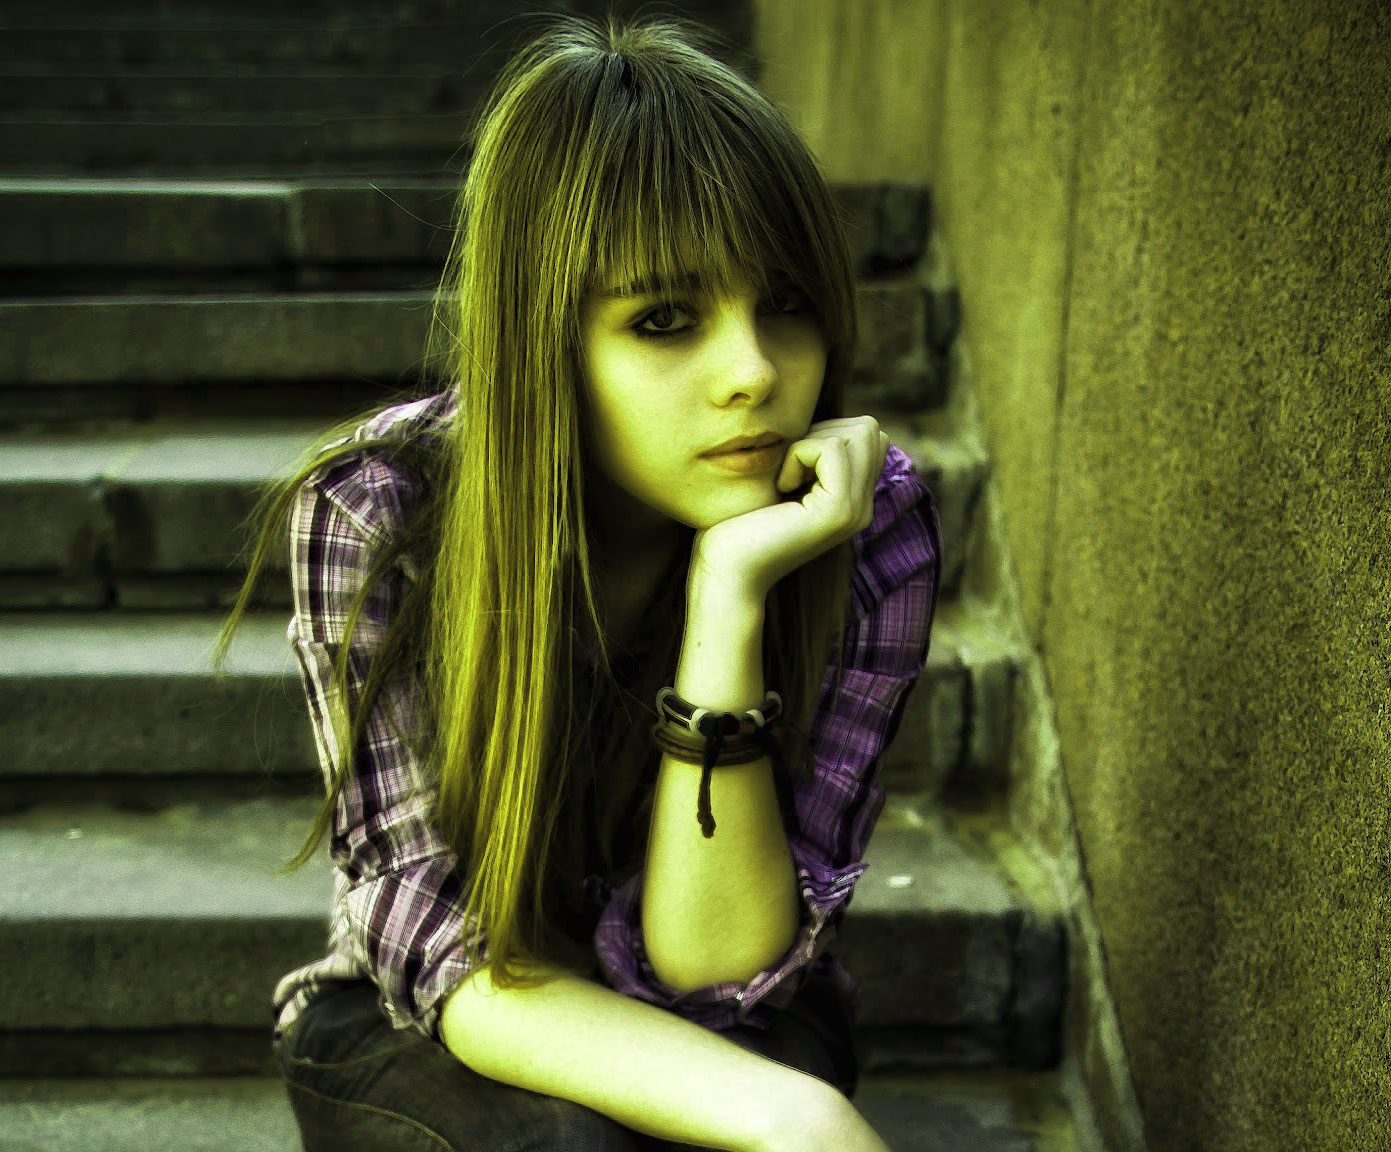 Alone Girls sweet whatapp dp Images